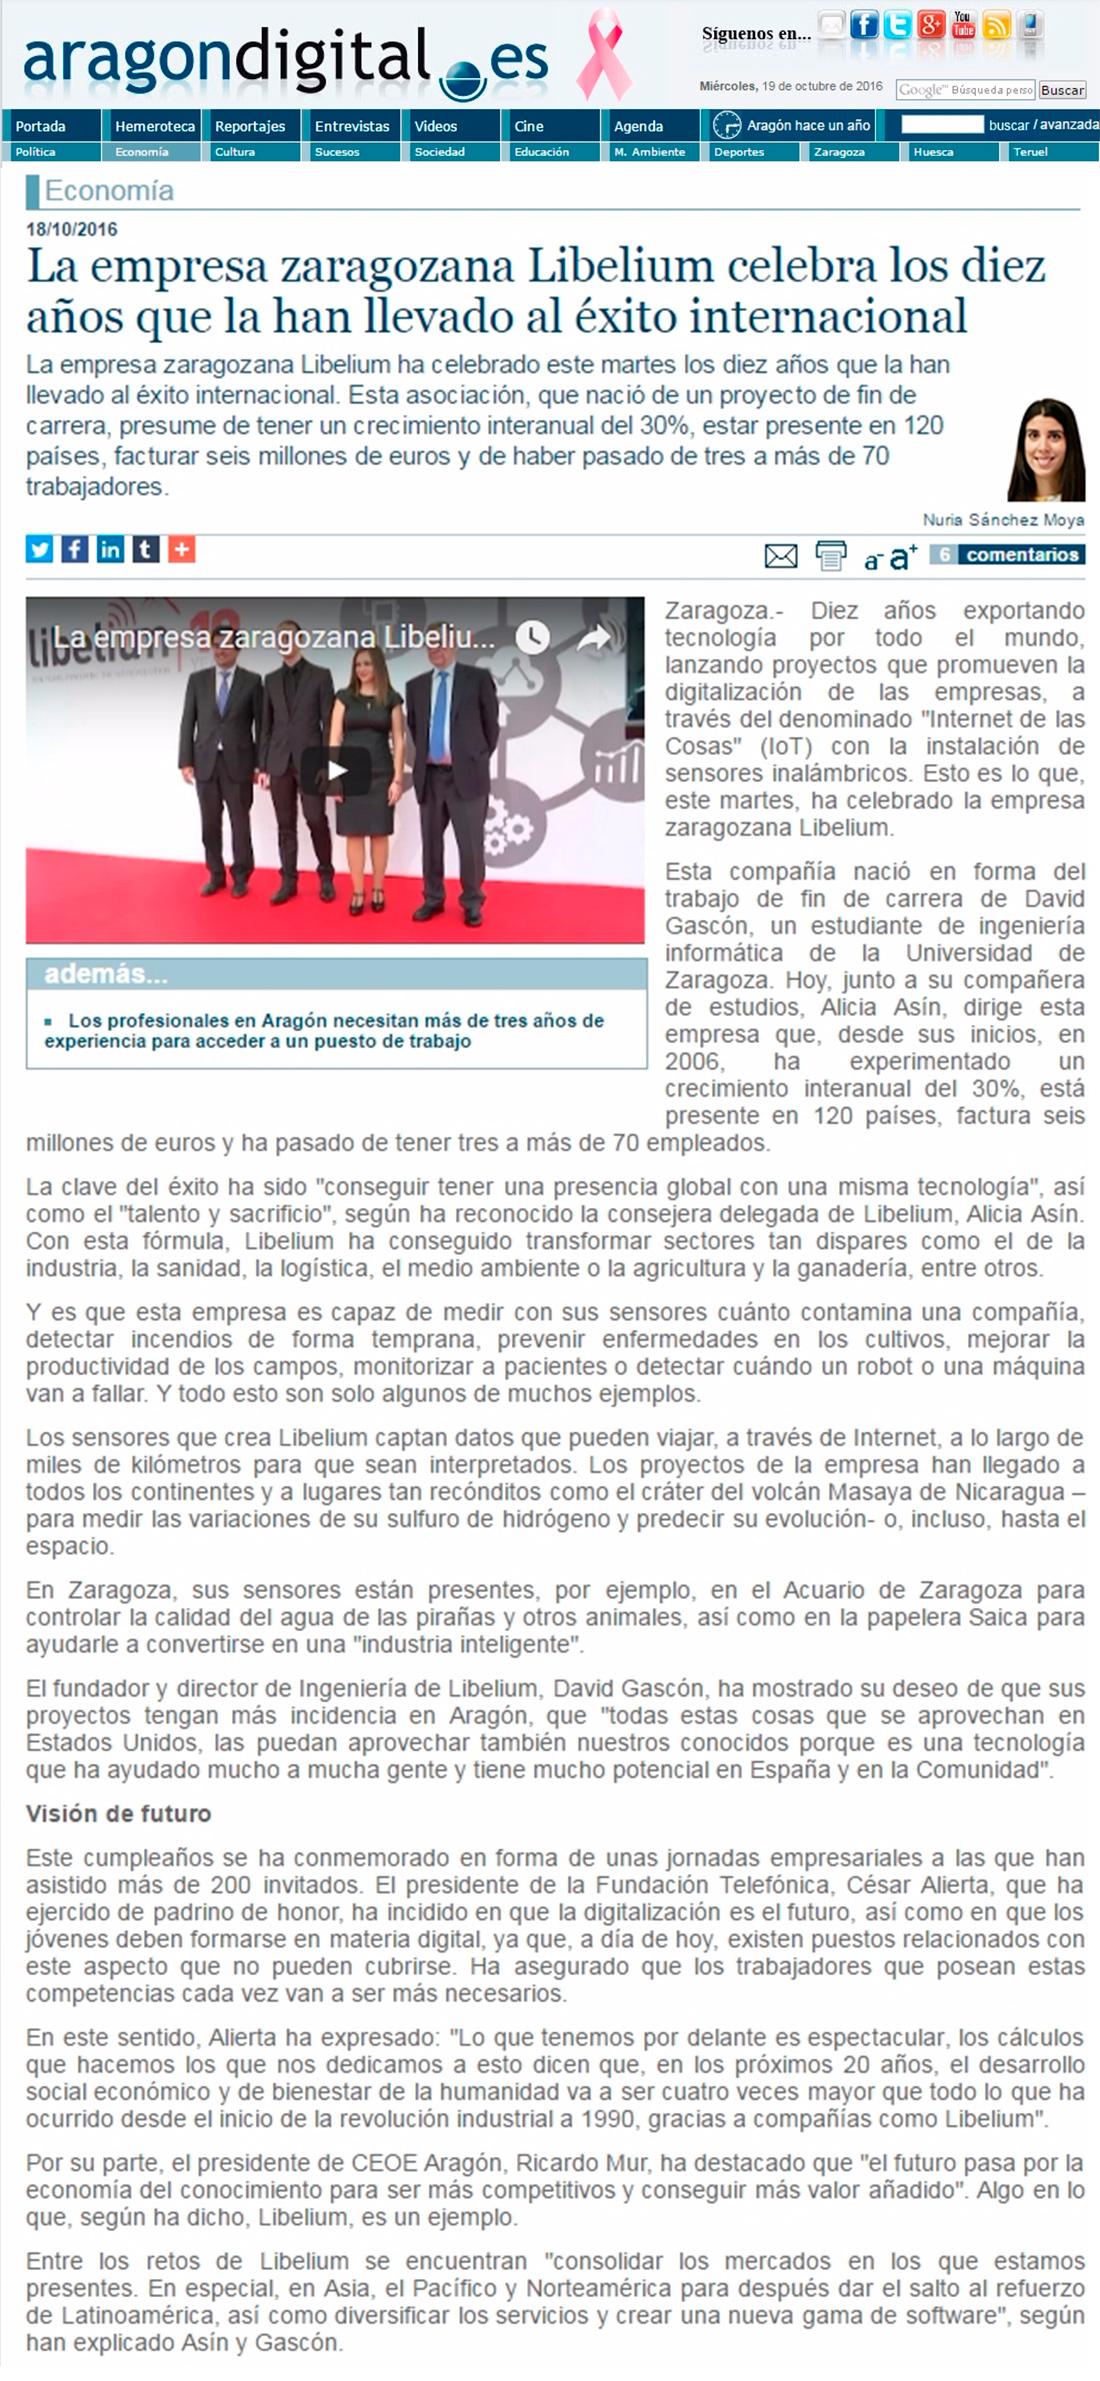 Aragondigital.es – La empresa zaragozana Libelium celebra diez años